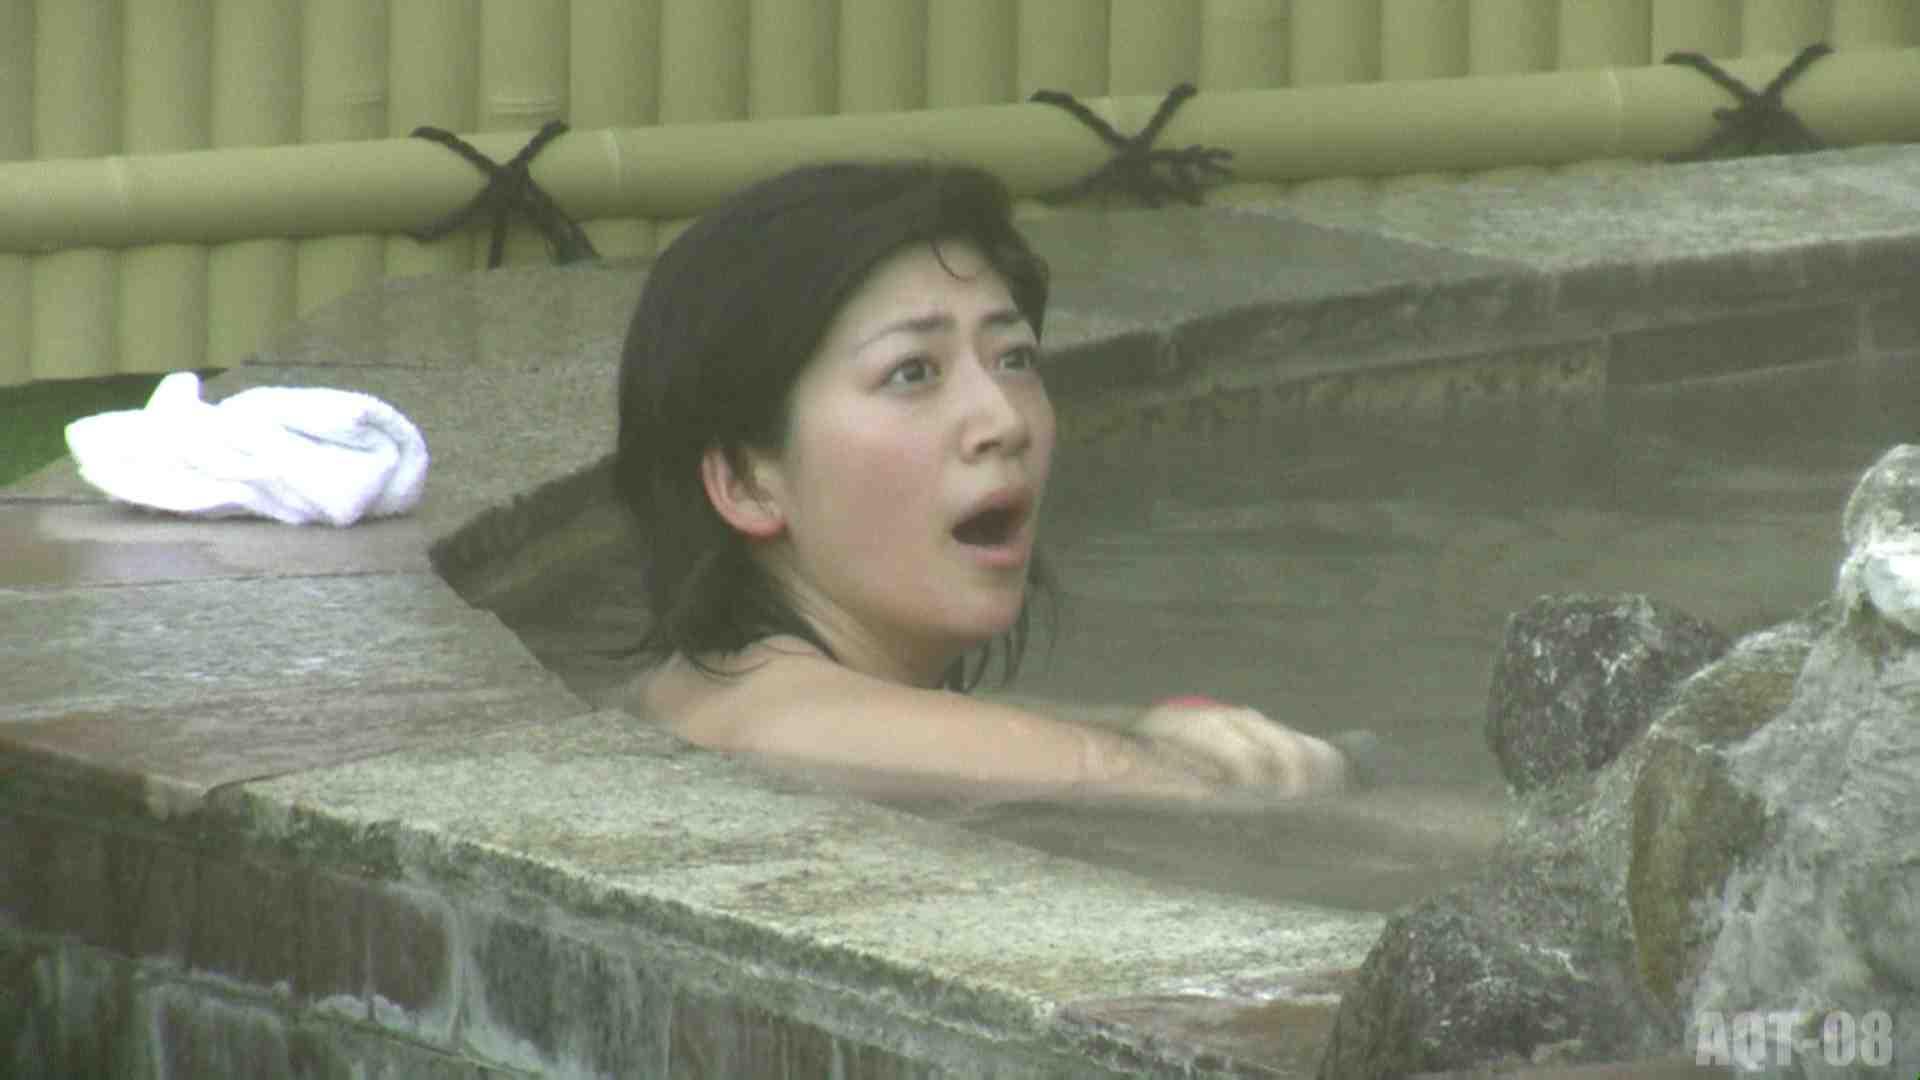 Aquaな露天風呂Vol.776 露天風呂編 | 盗撮シリーズ  75PIX 49